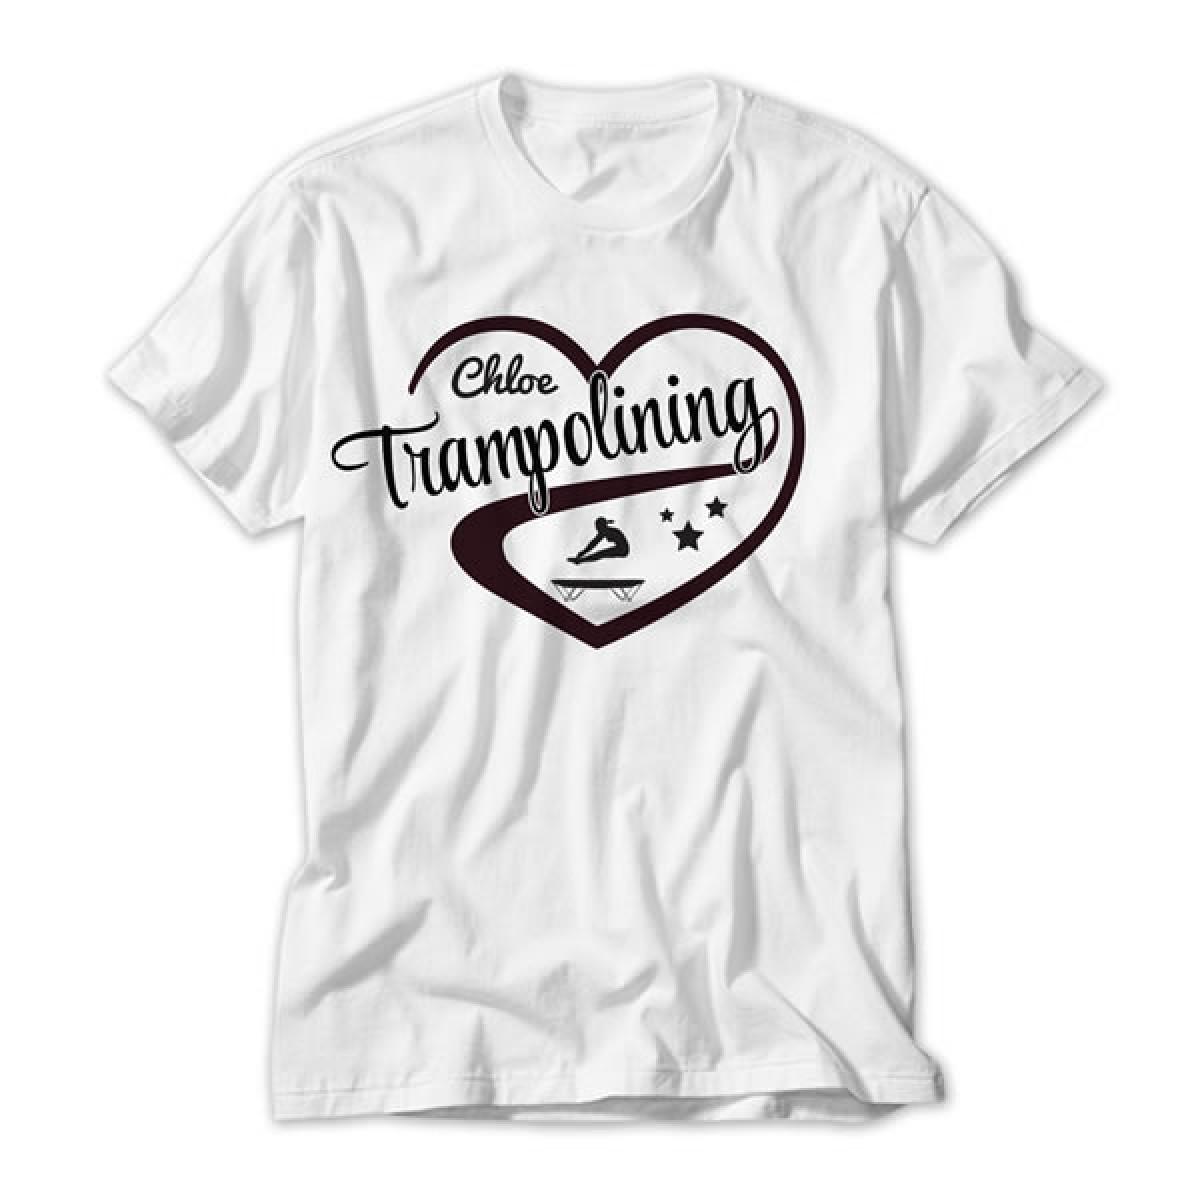 love trampolining design personalised kids t shirt. Black Bedroom Furniture Sets. Home Design Ideas